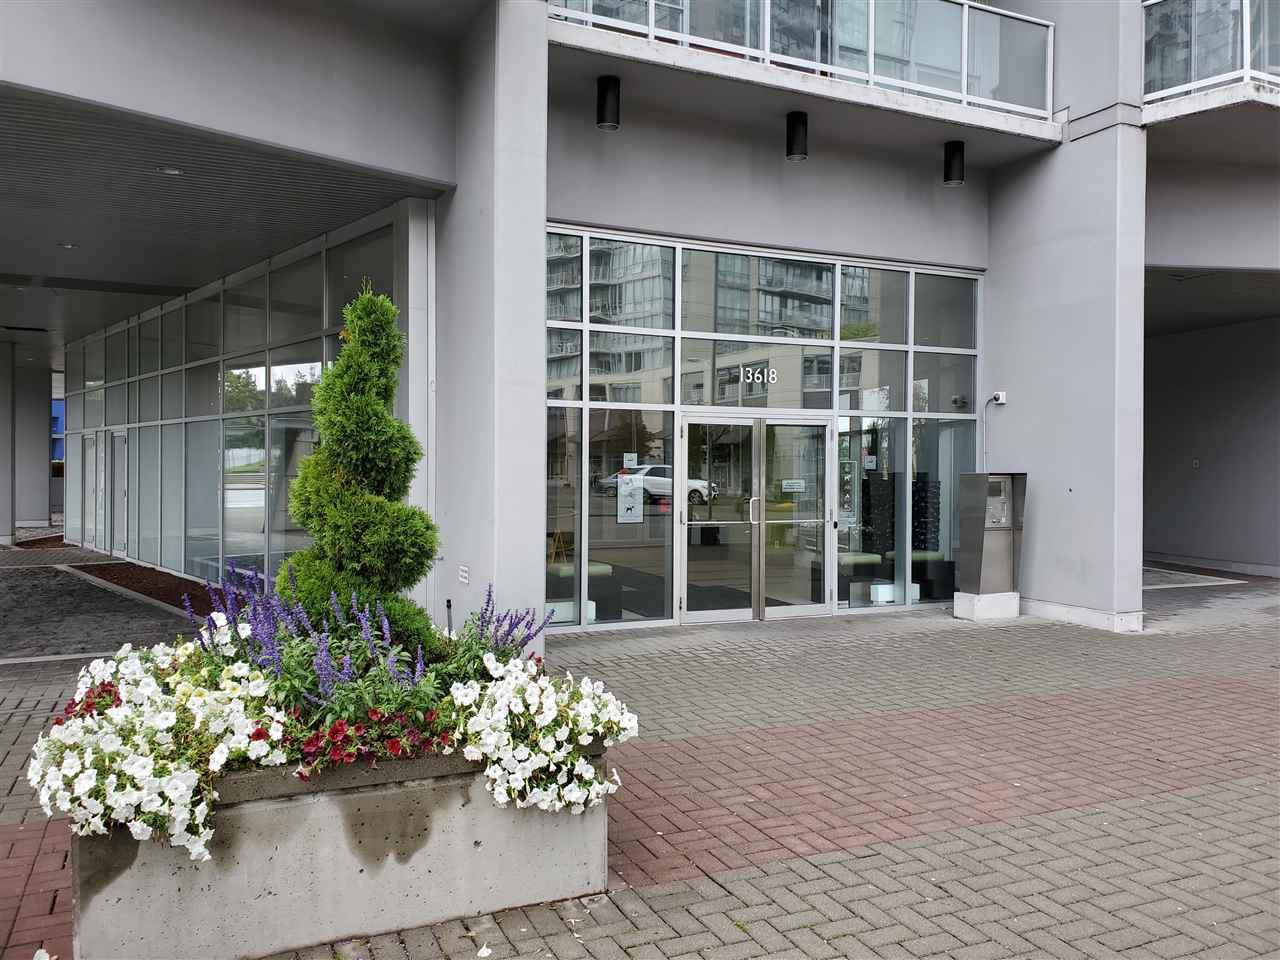 Main Photo: 401 - 13618 100 Ave in Surrey: Whalley Condo for sale (North Surrey)  : MLS®# R2501888